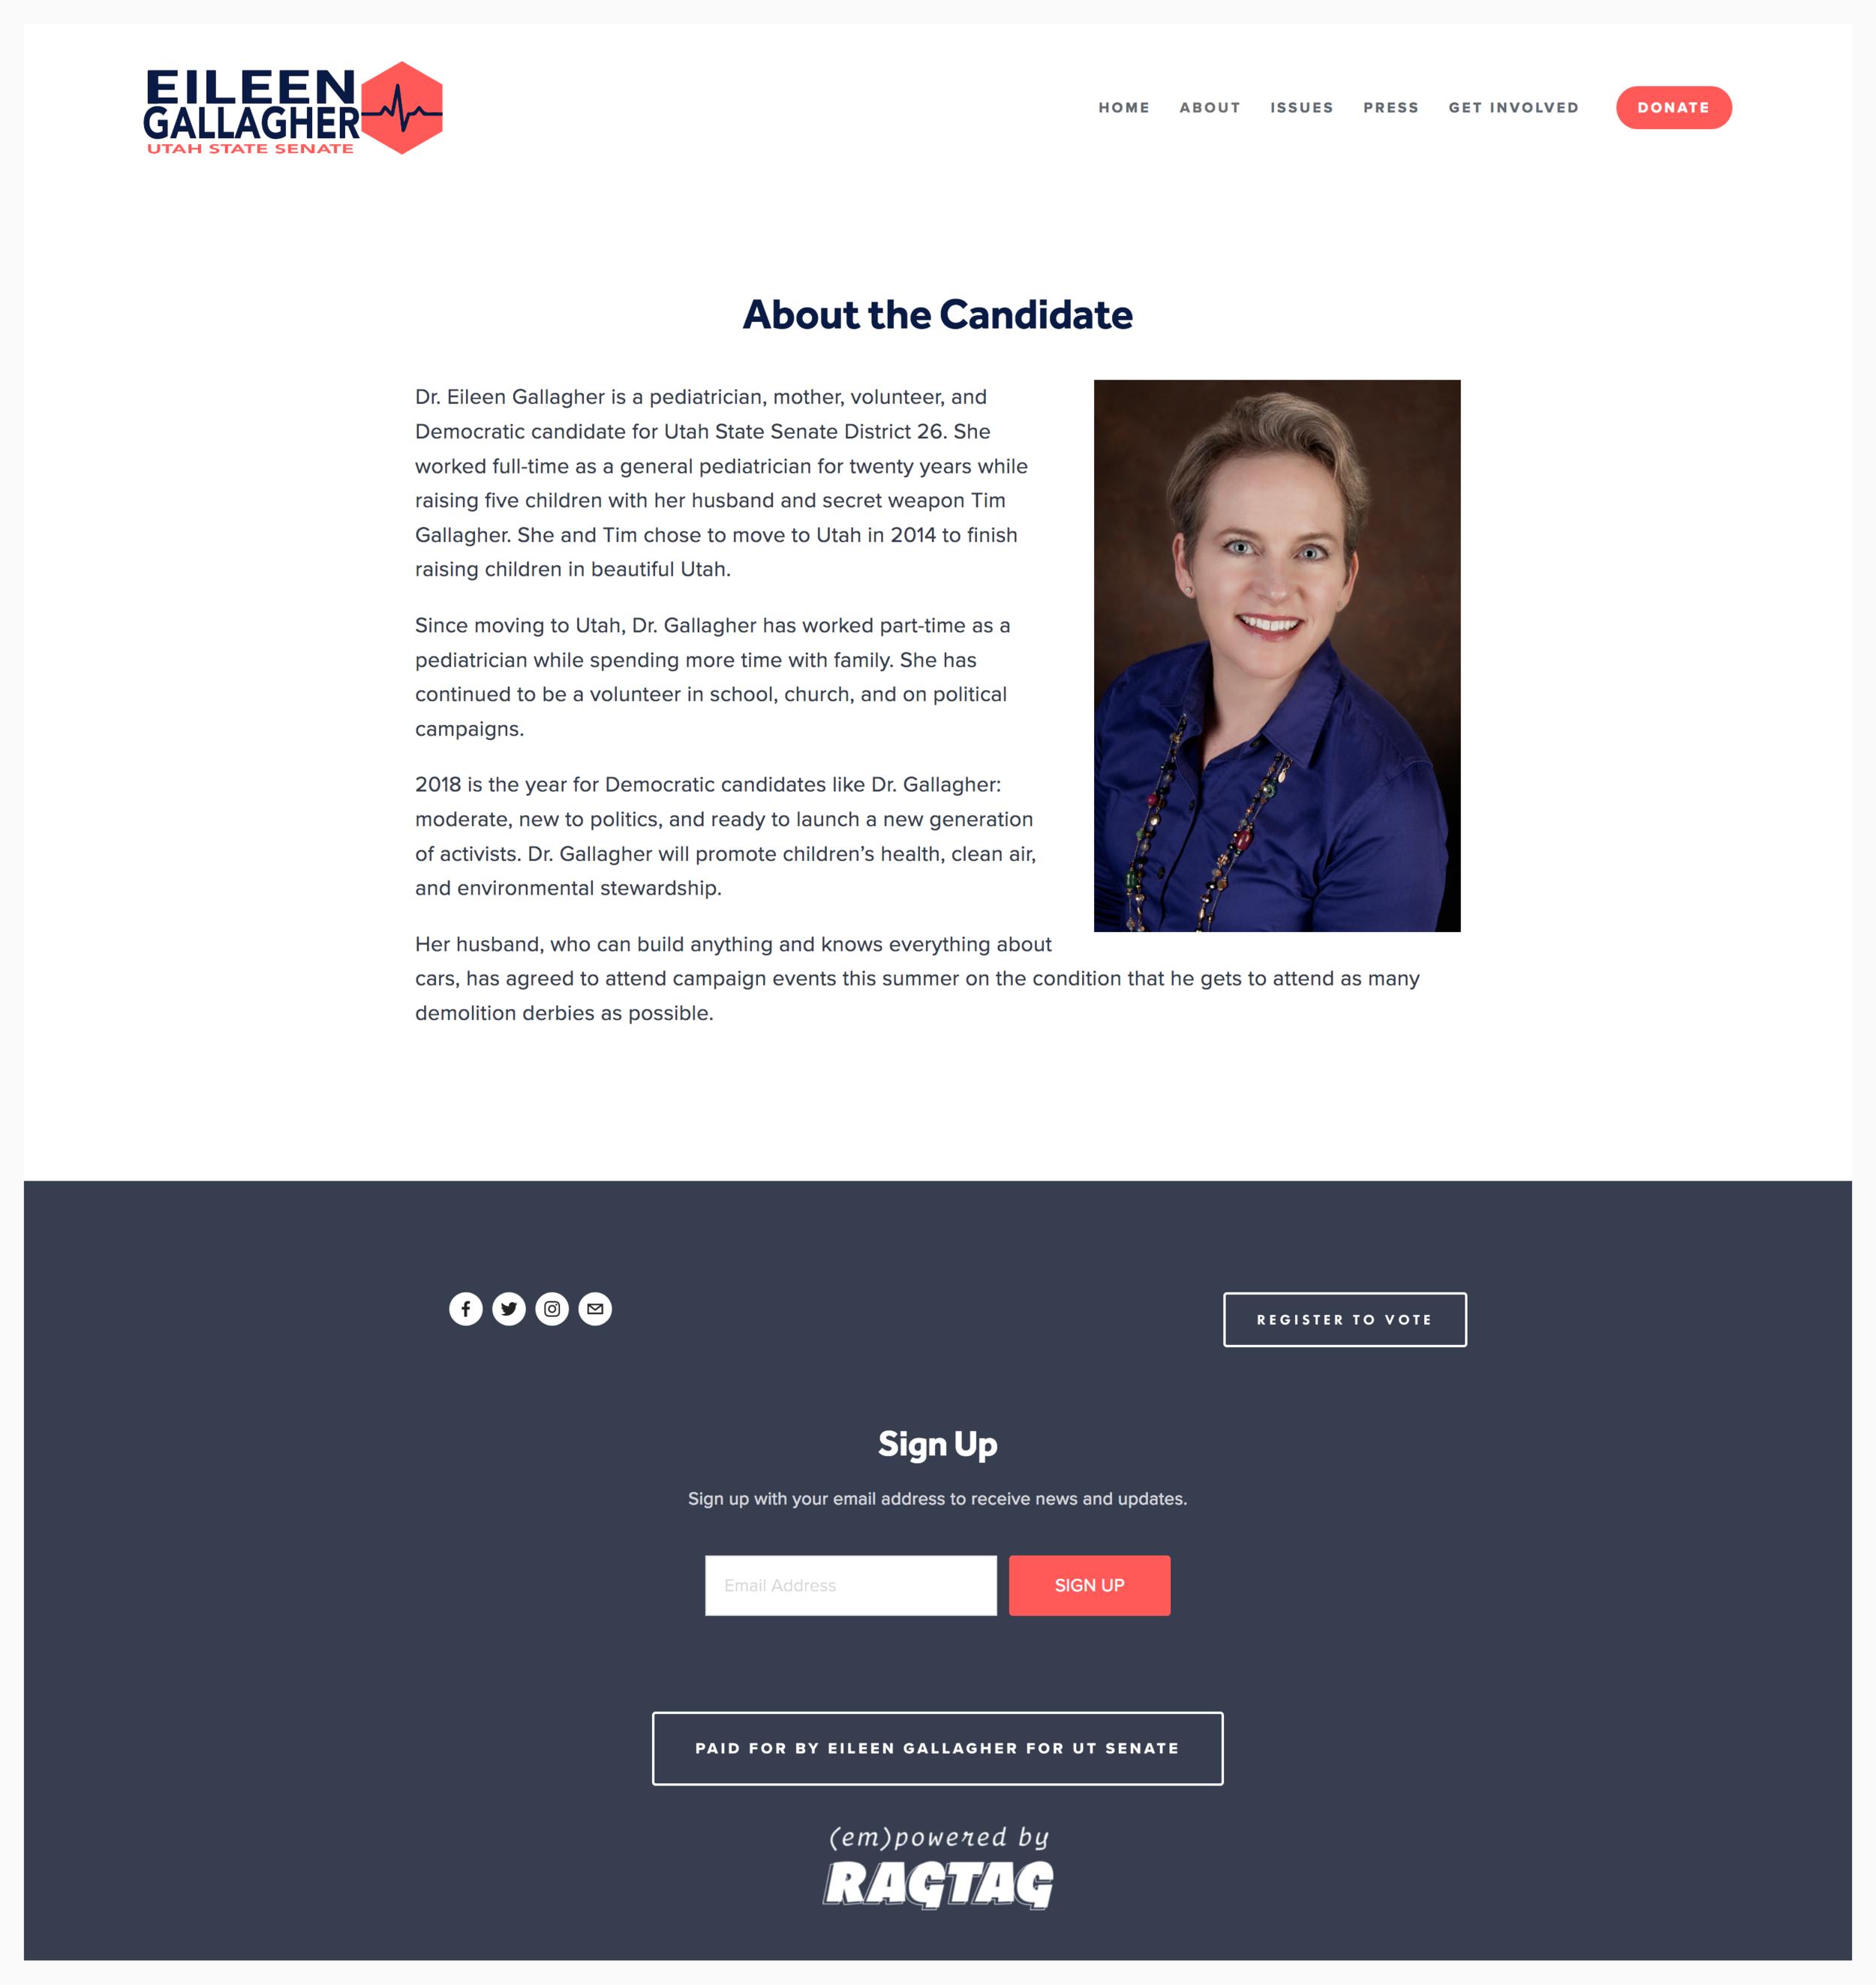 Eileen Gallagher for Utah State Senate's homepage.